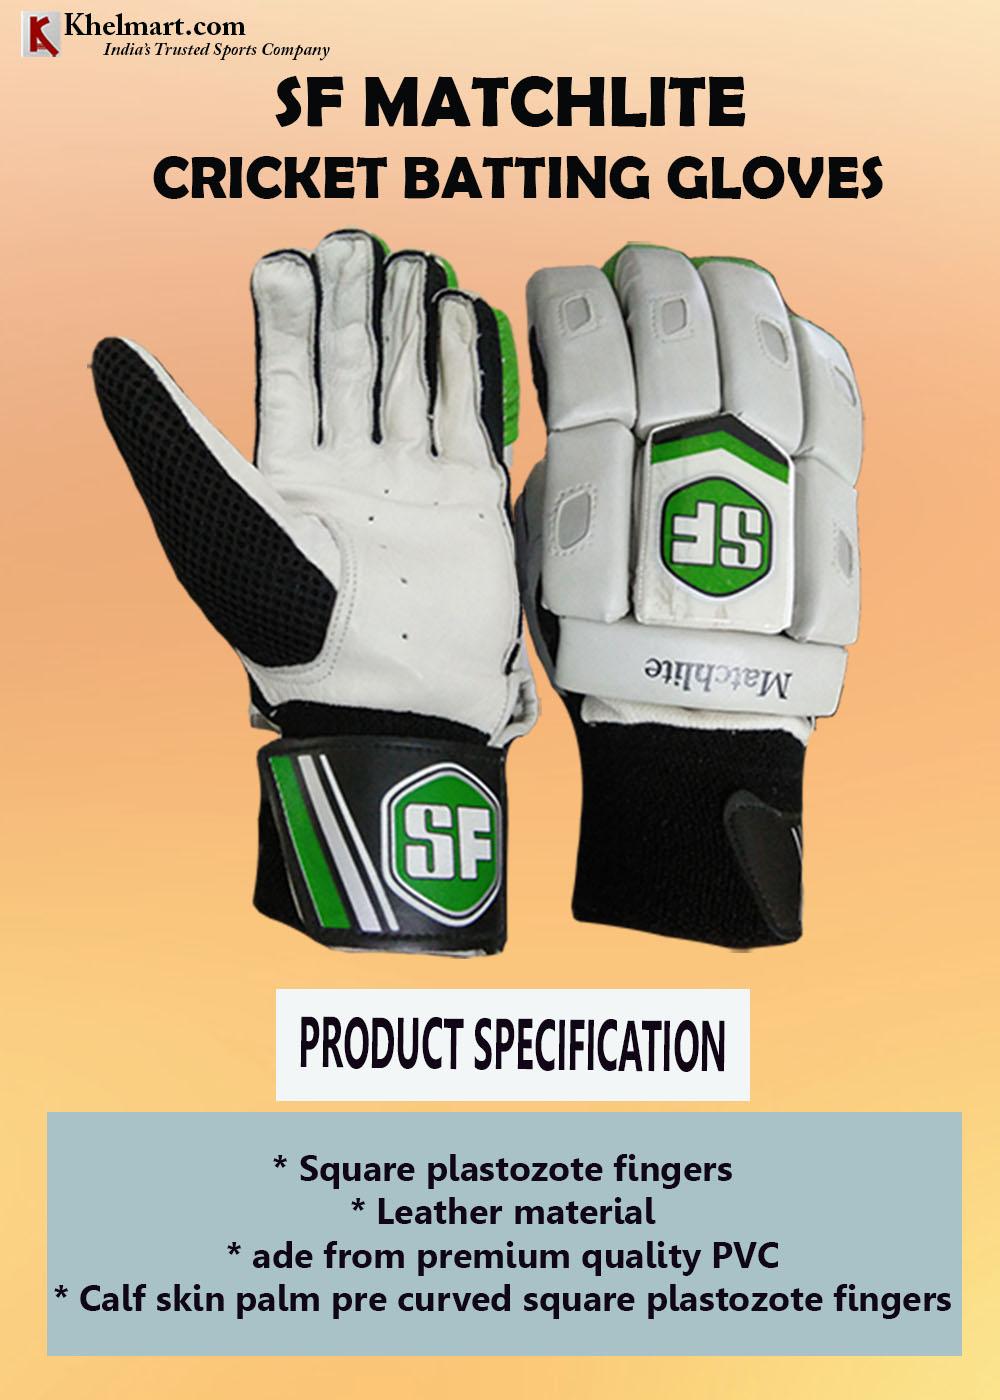 SF MatchLite Batting Gloves